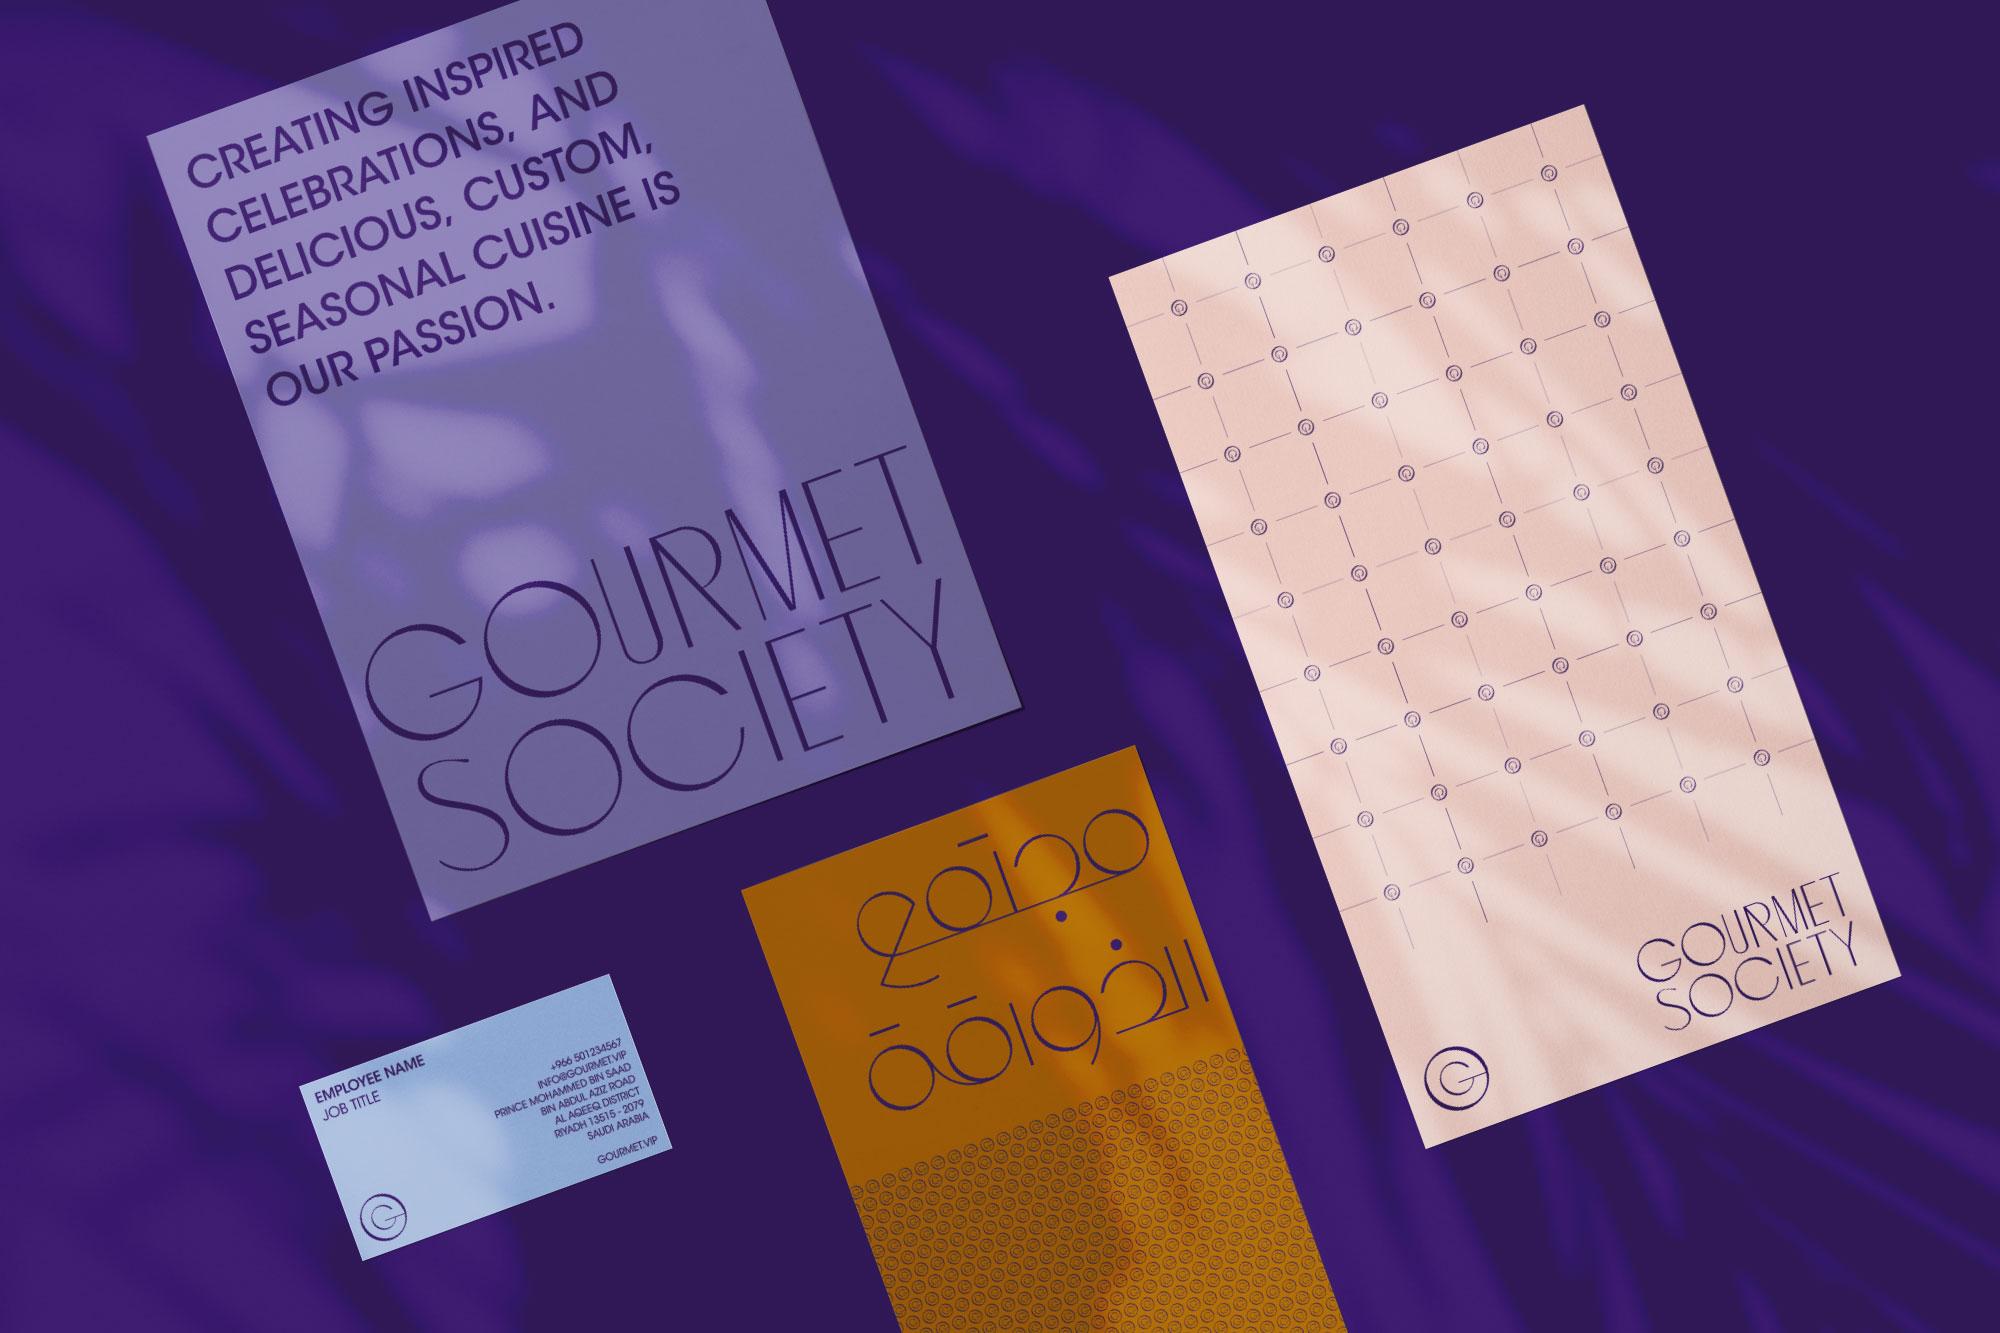 GourmetSociety-Work-By-YaStudio-06-1